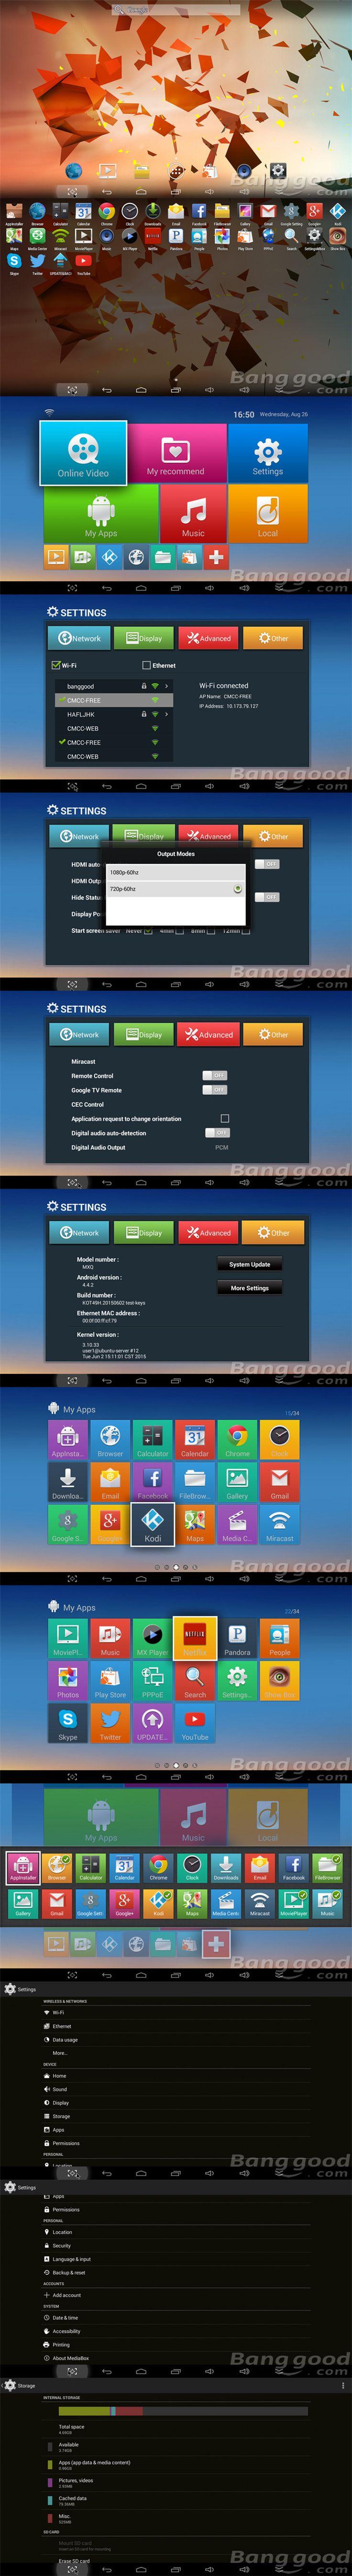 MXQ S805 1GB/8GB KODI 14.2 Quad Core Android 4.4 1080P HD H.265 HEVC TV Box Android Mini PC